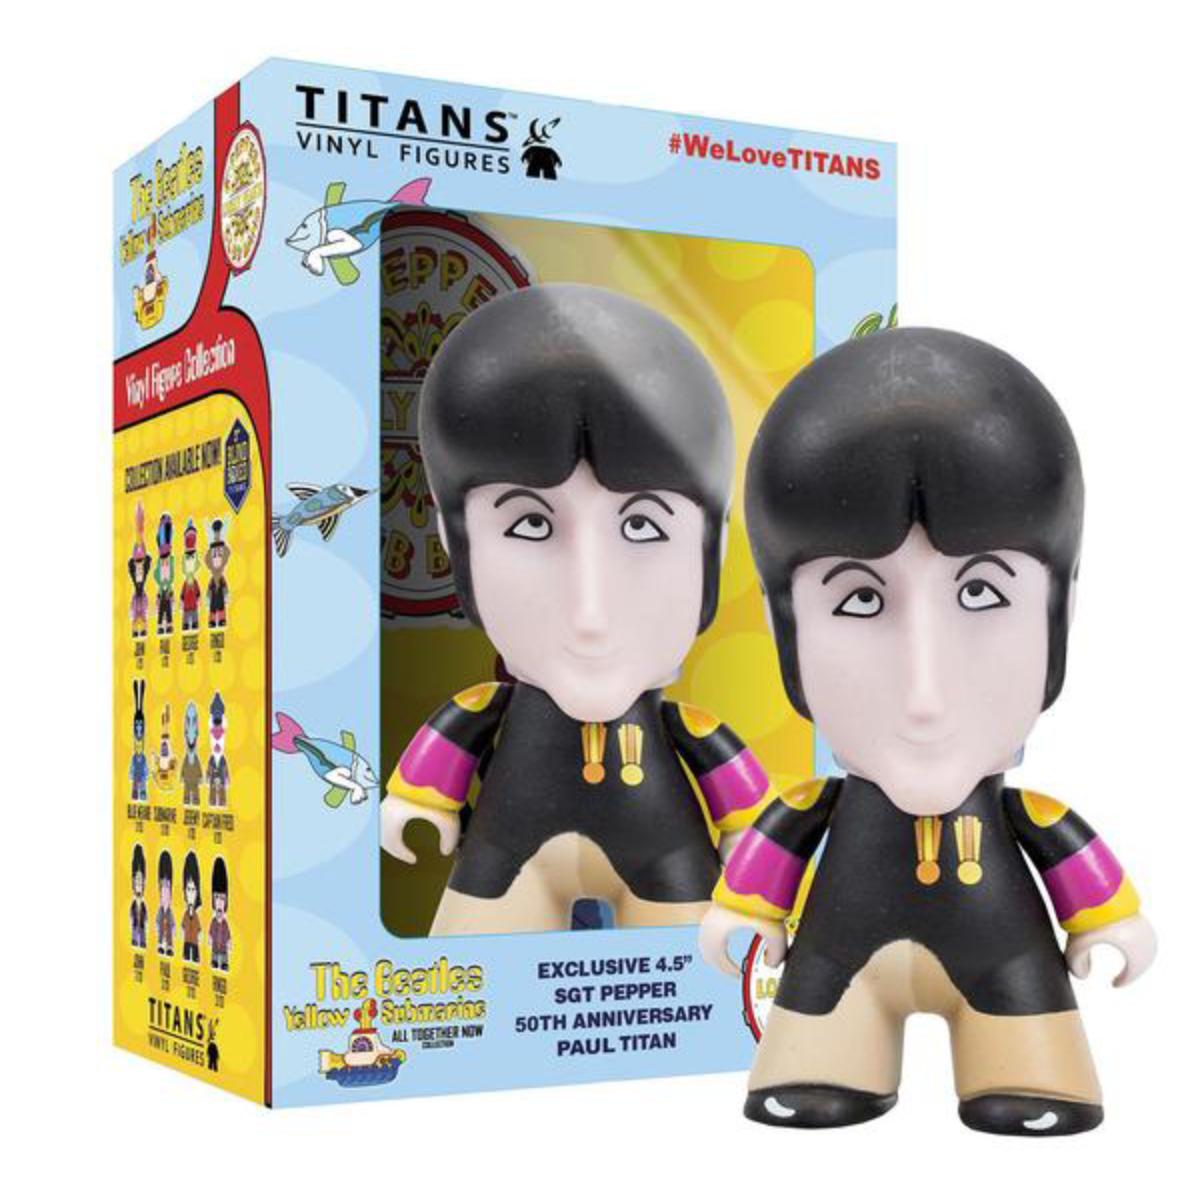 "The Beatles TITANS: 4.5"" Sgt Pepper Disguise Paul"